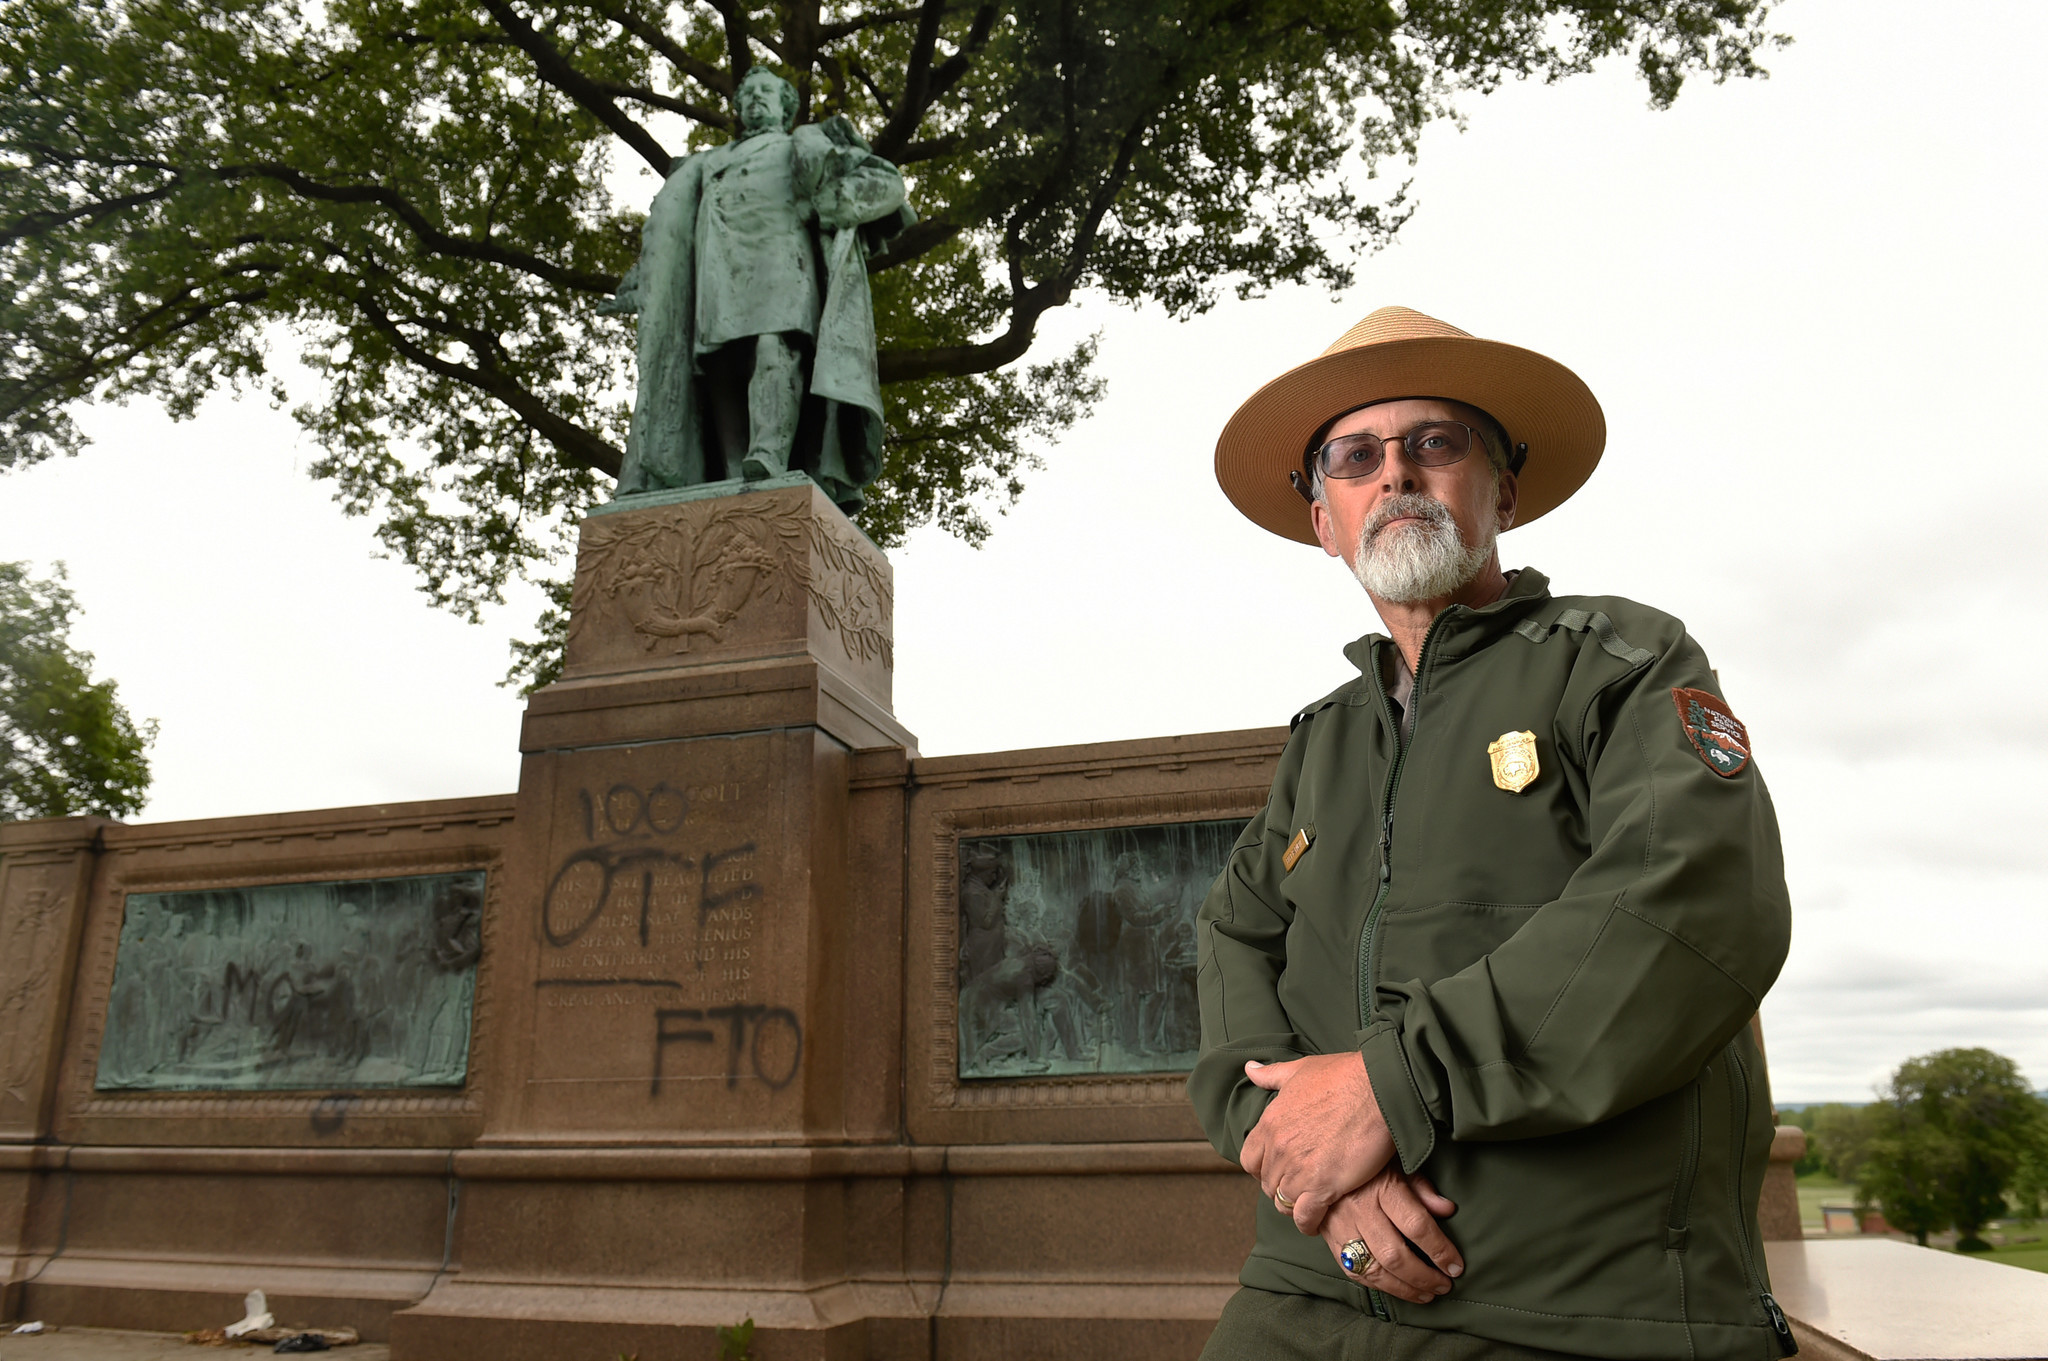 Coltsville National Historical Park Tours